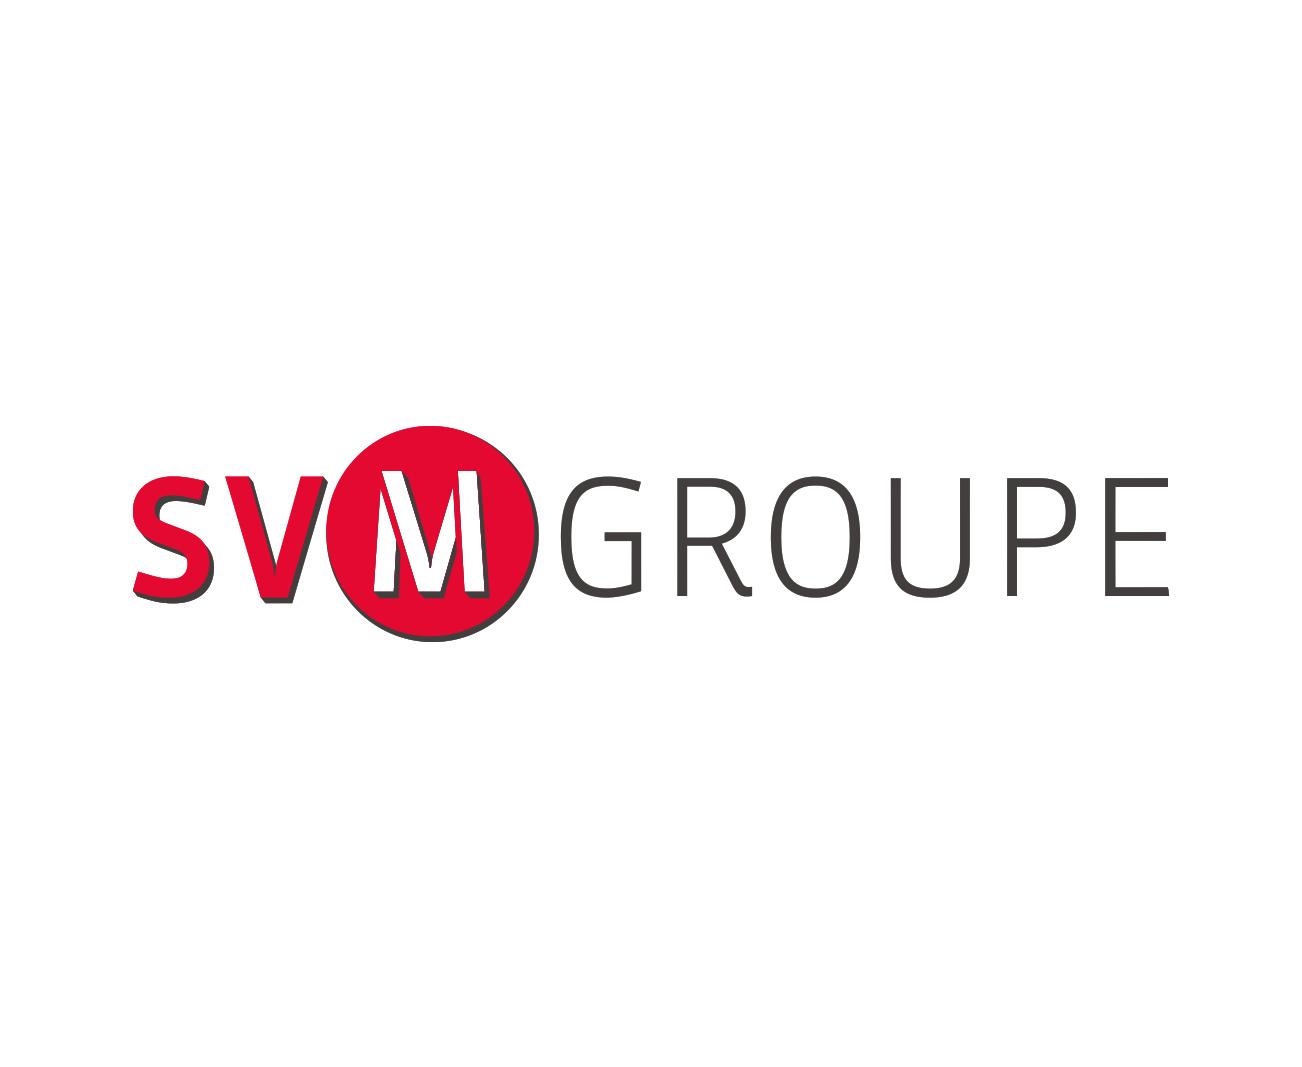 logo-slider-svmgroupe3